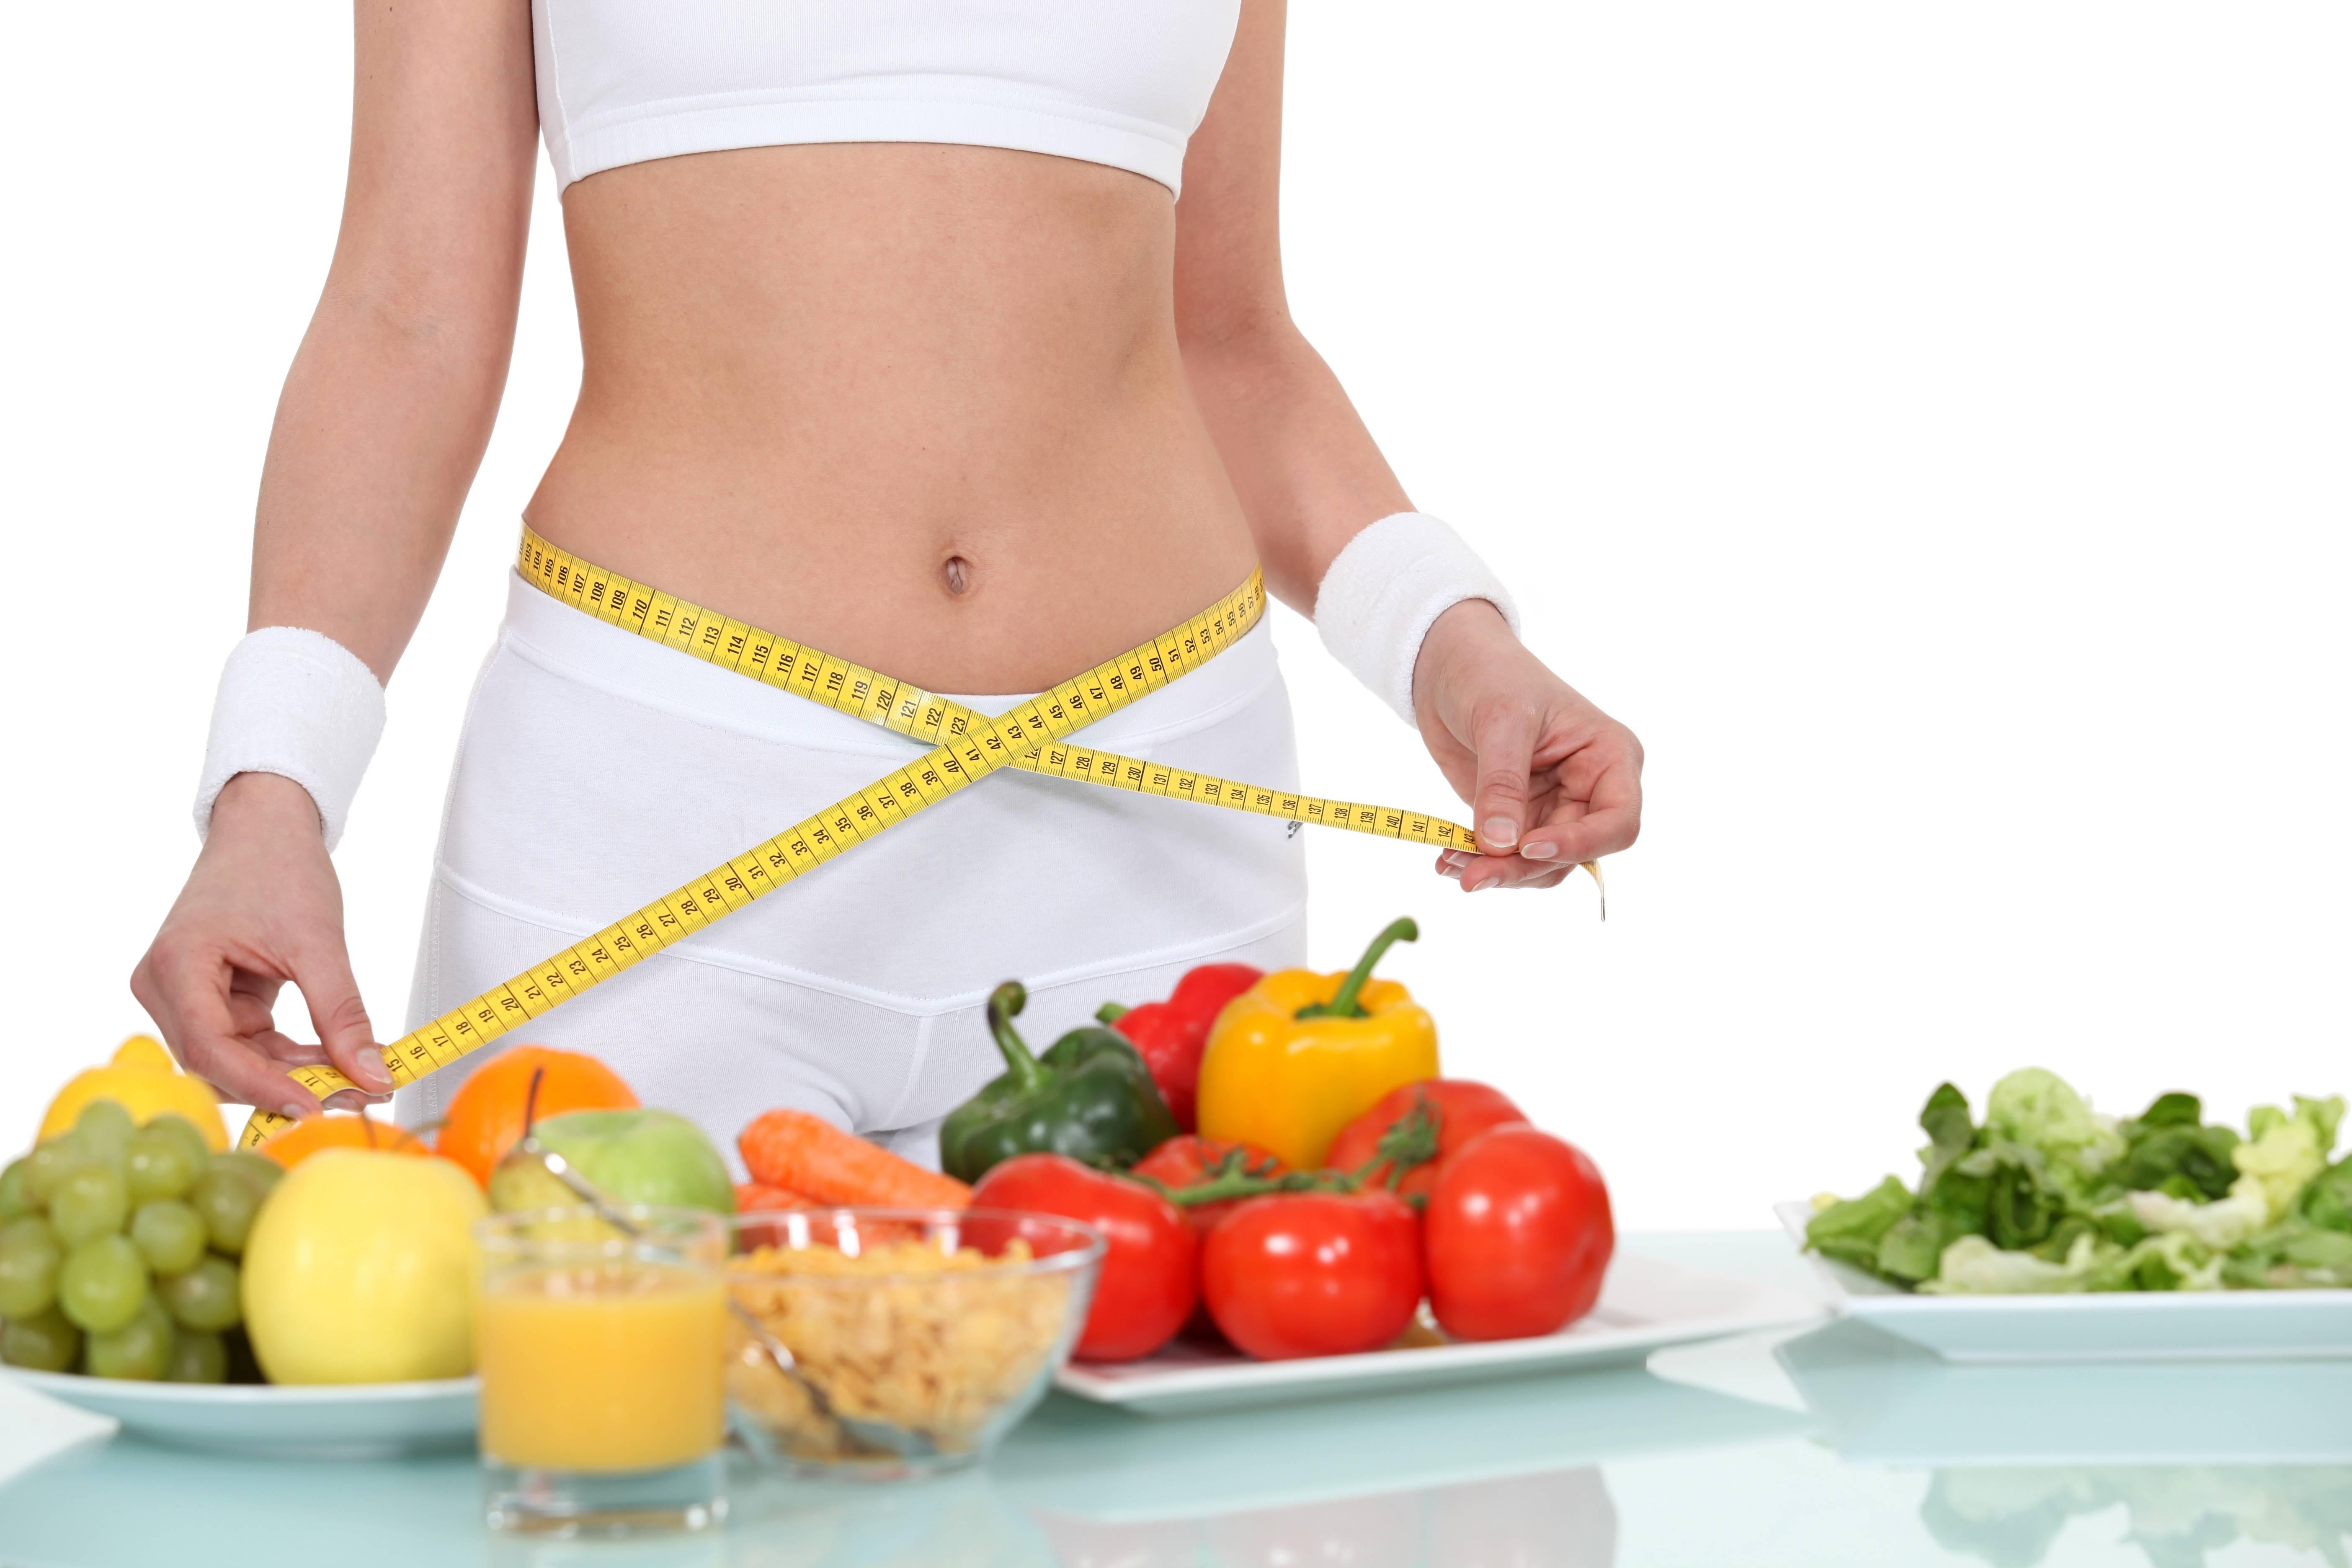 dieta cibi per dimagrire